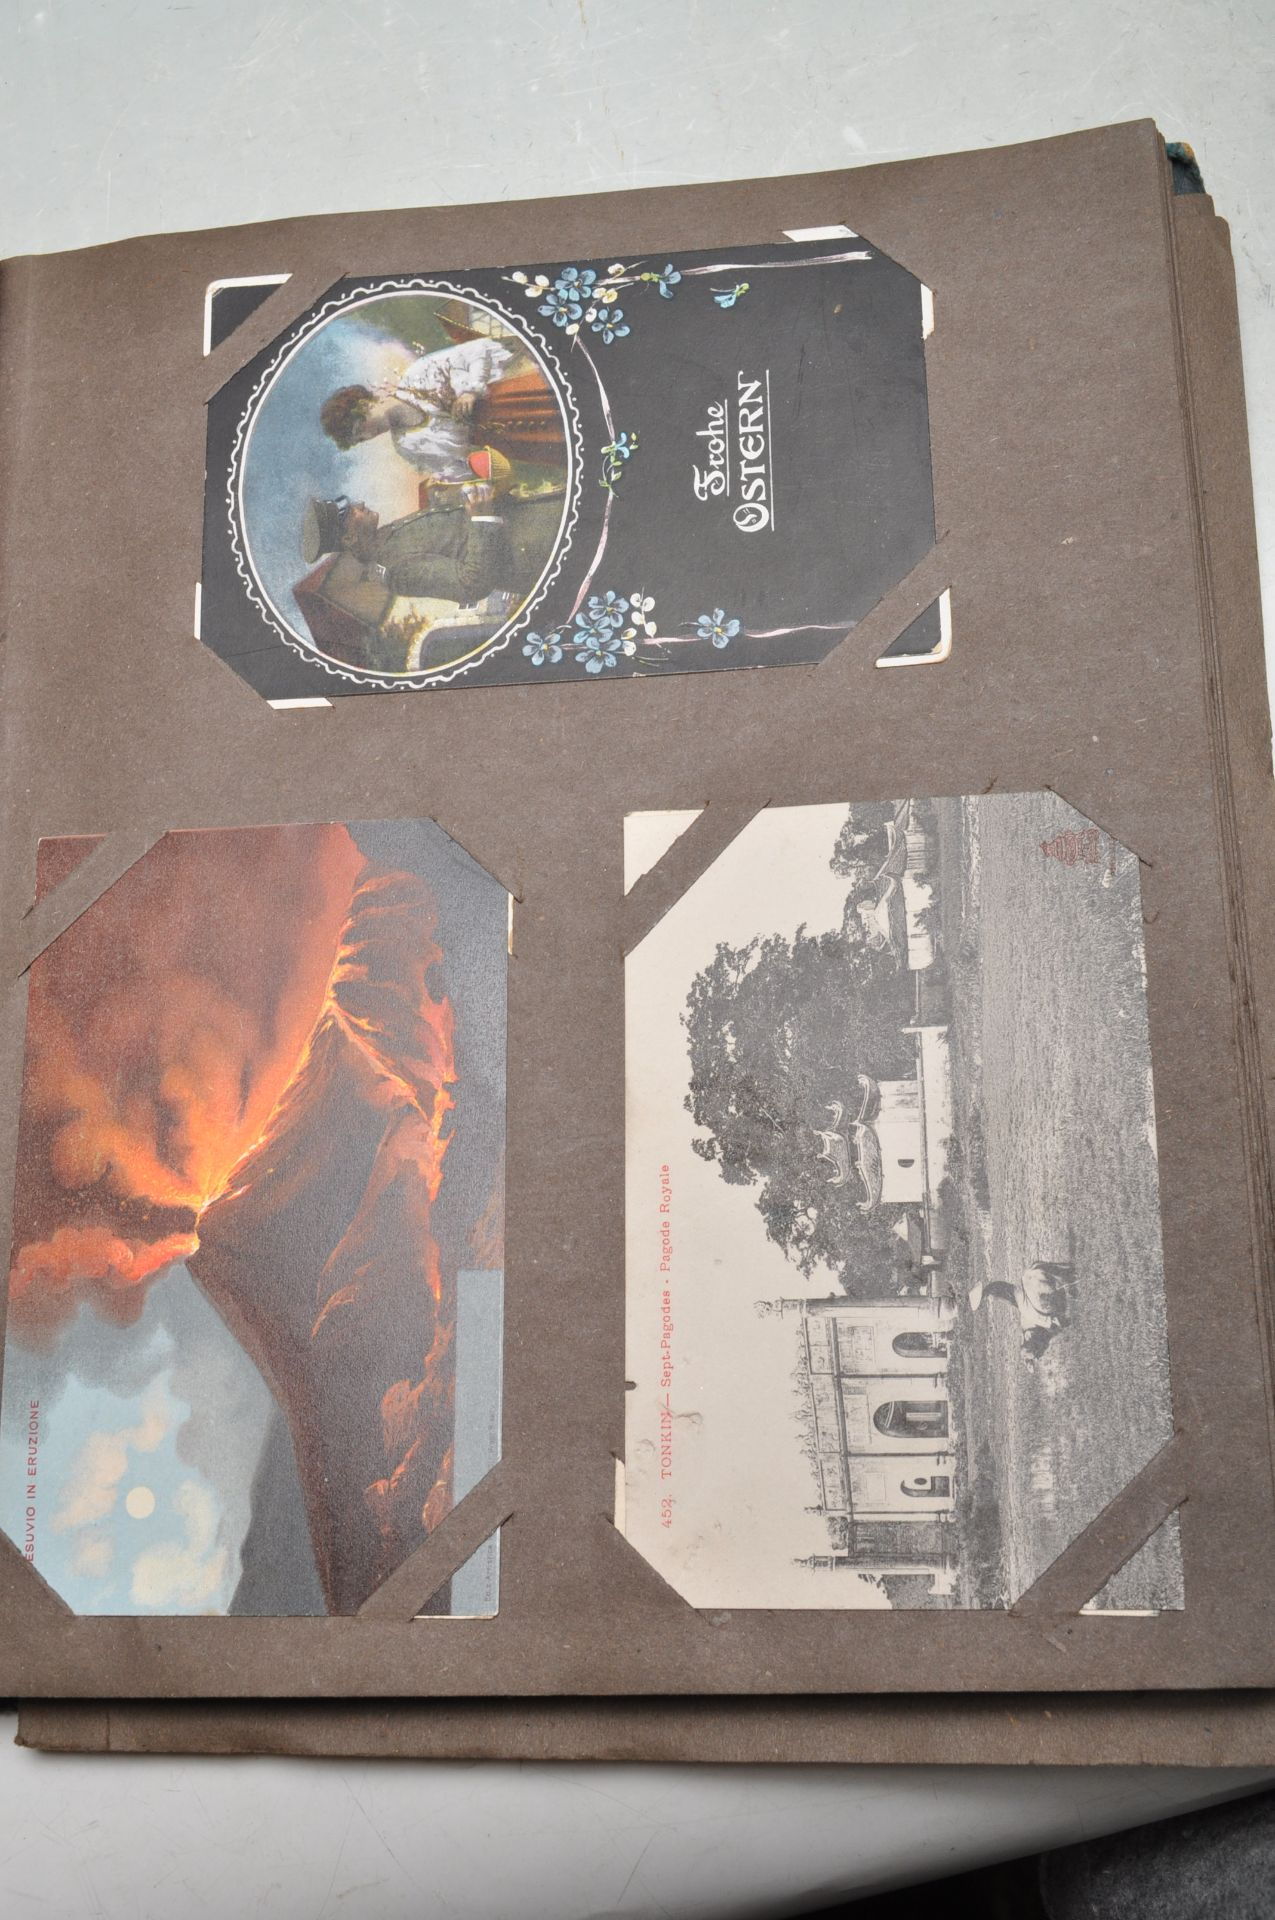 ALBUM OF FOREIGN POSTCARDS - ALL CIRCA WW1 PERIOD - Bild 19 aus 23